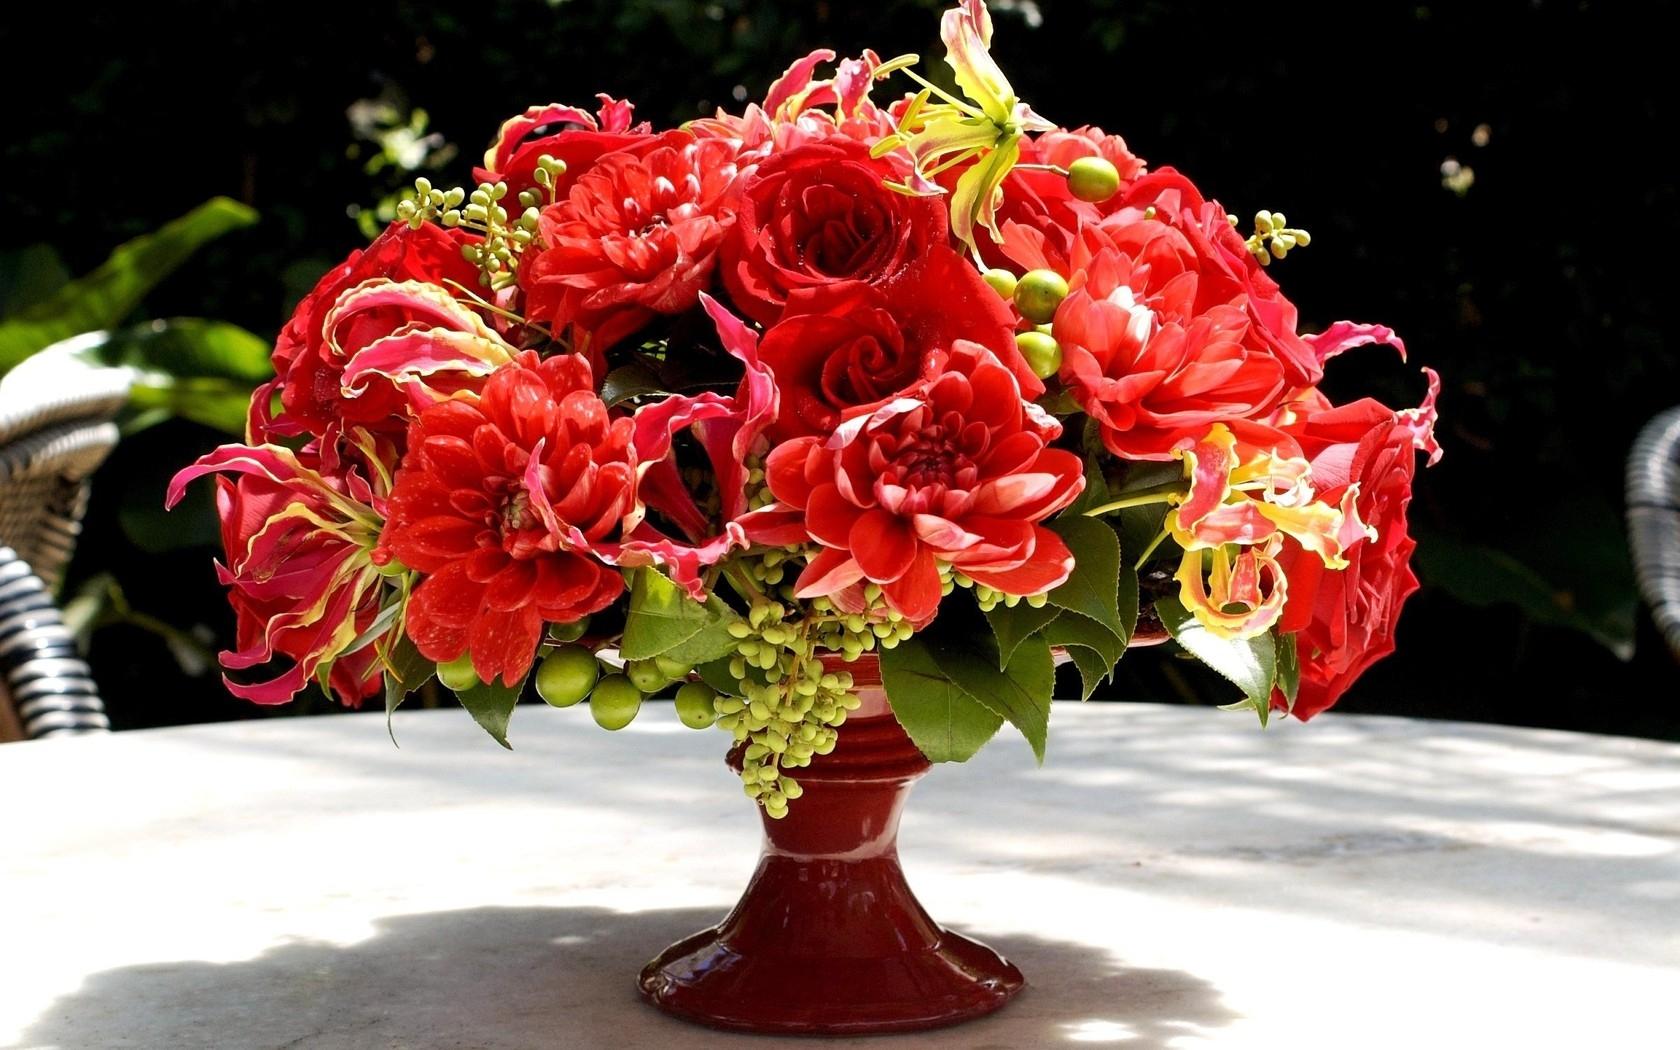 hintergrundbilder rot tabelle rose rosa dahlien blume sch nheit flora rosen strau. Black Bedroom Furniture Sets. Home Design Ideas